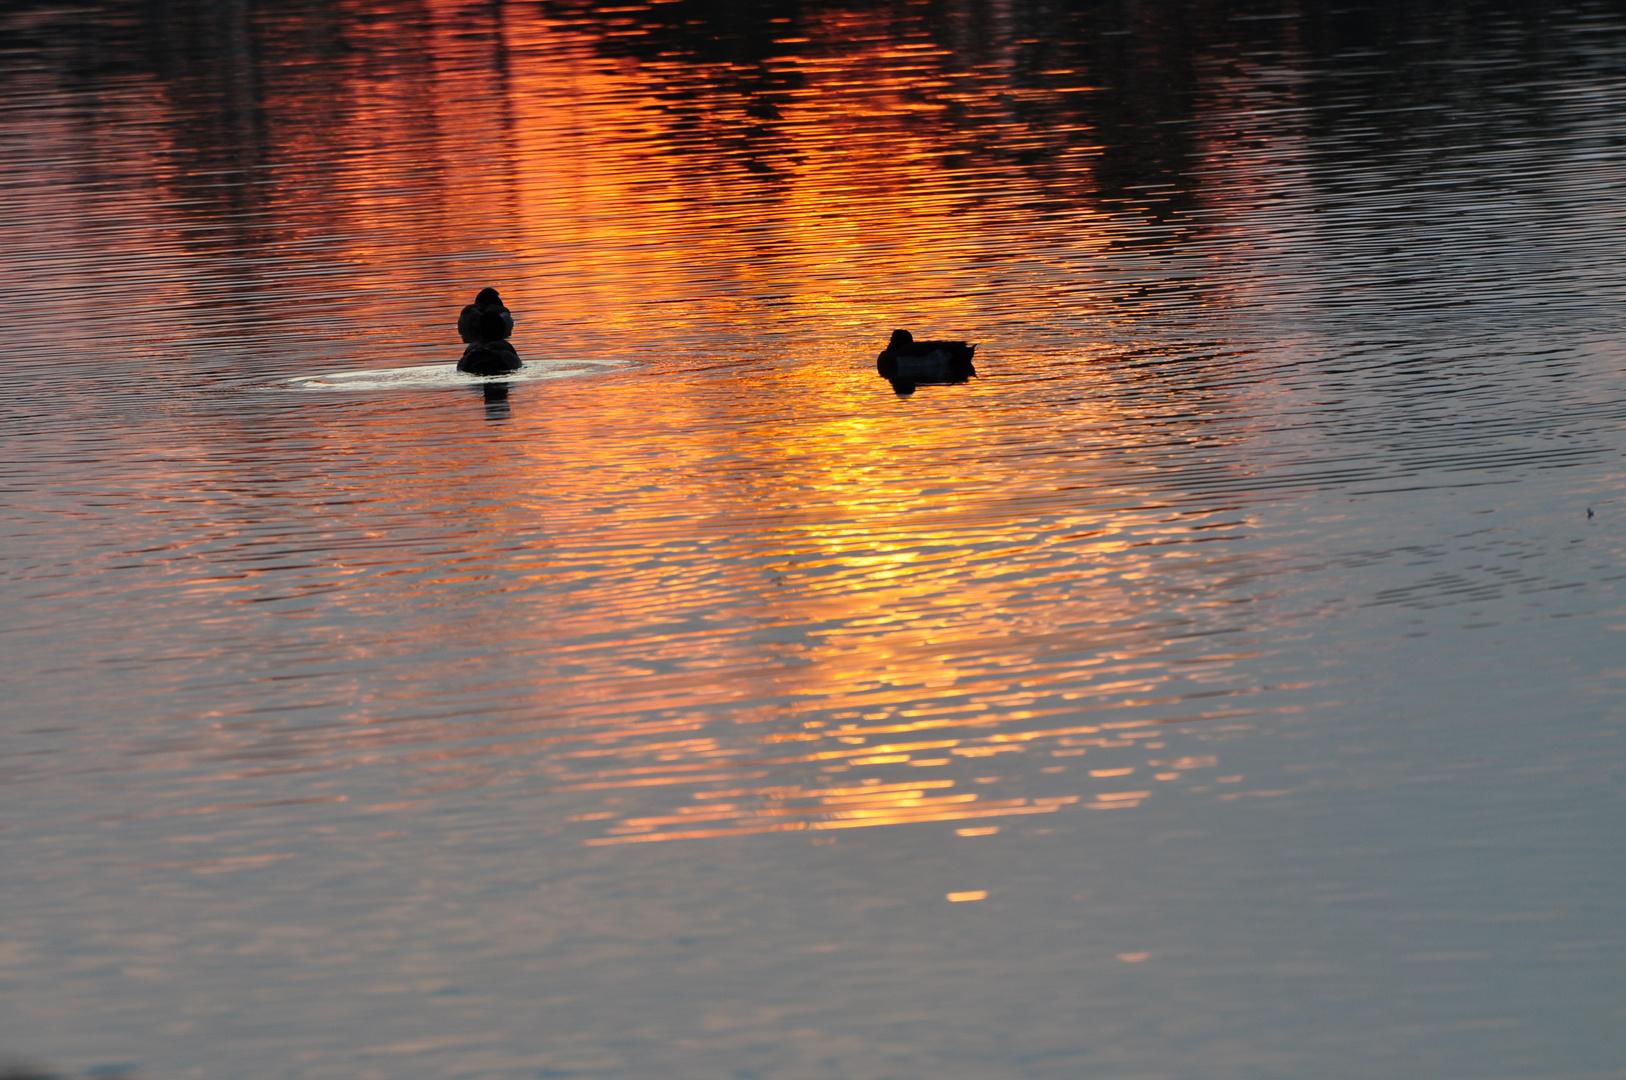 Sonnenuntergang am See in Langenhagen